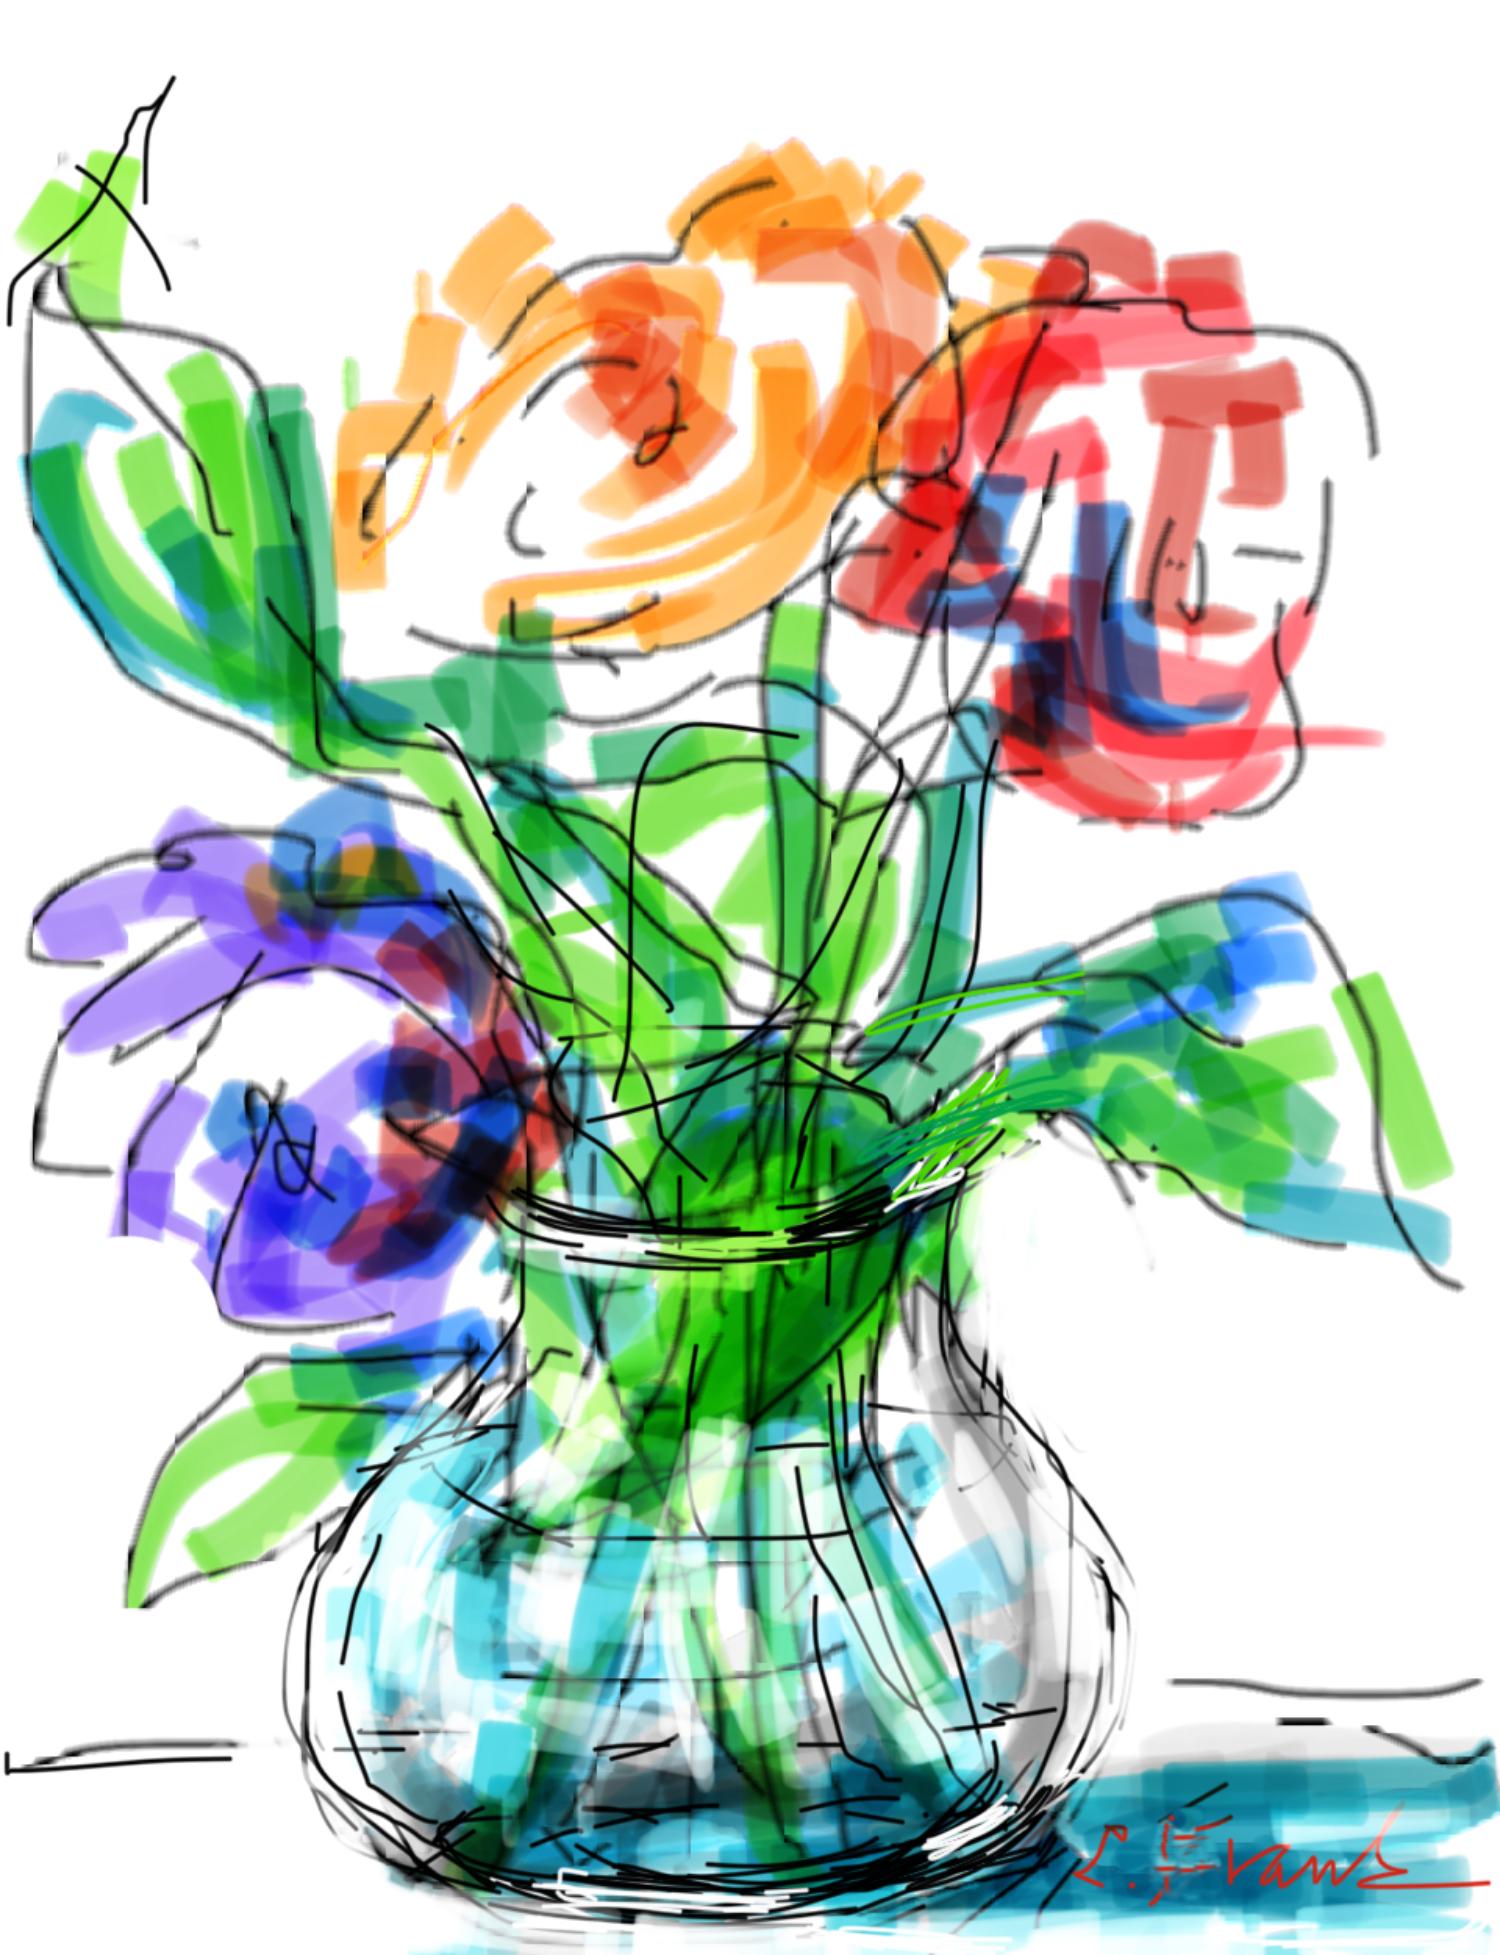 Whimsical Flowers in Vase